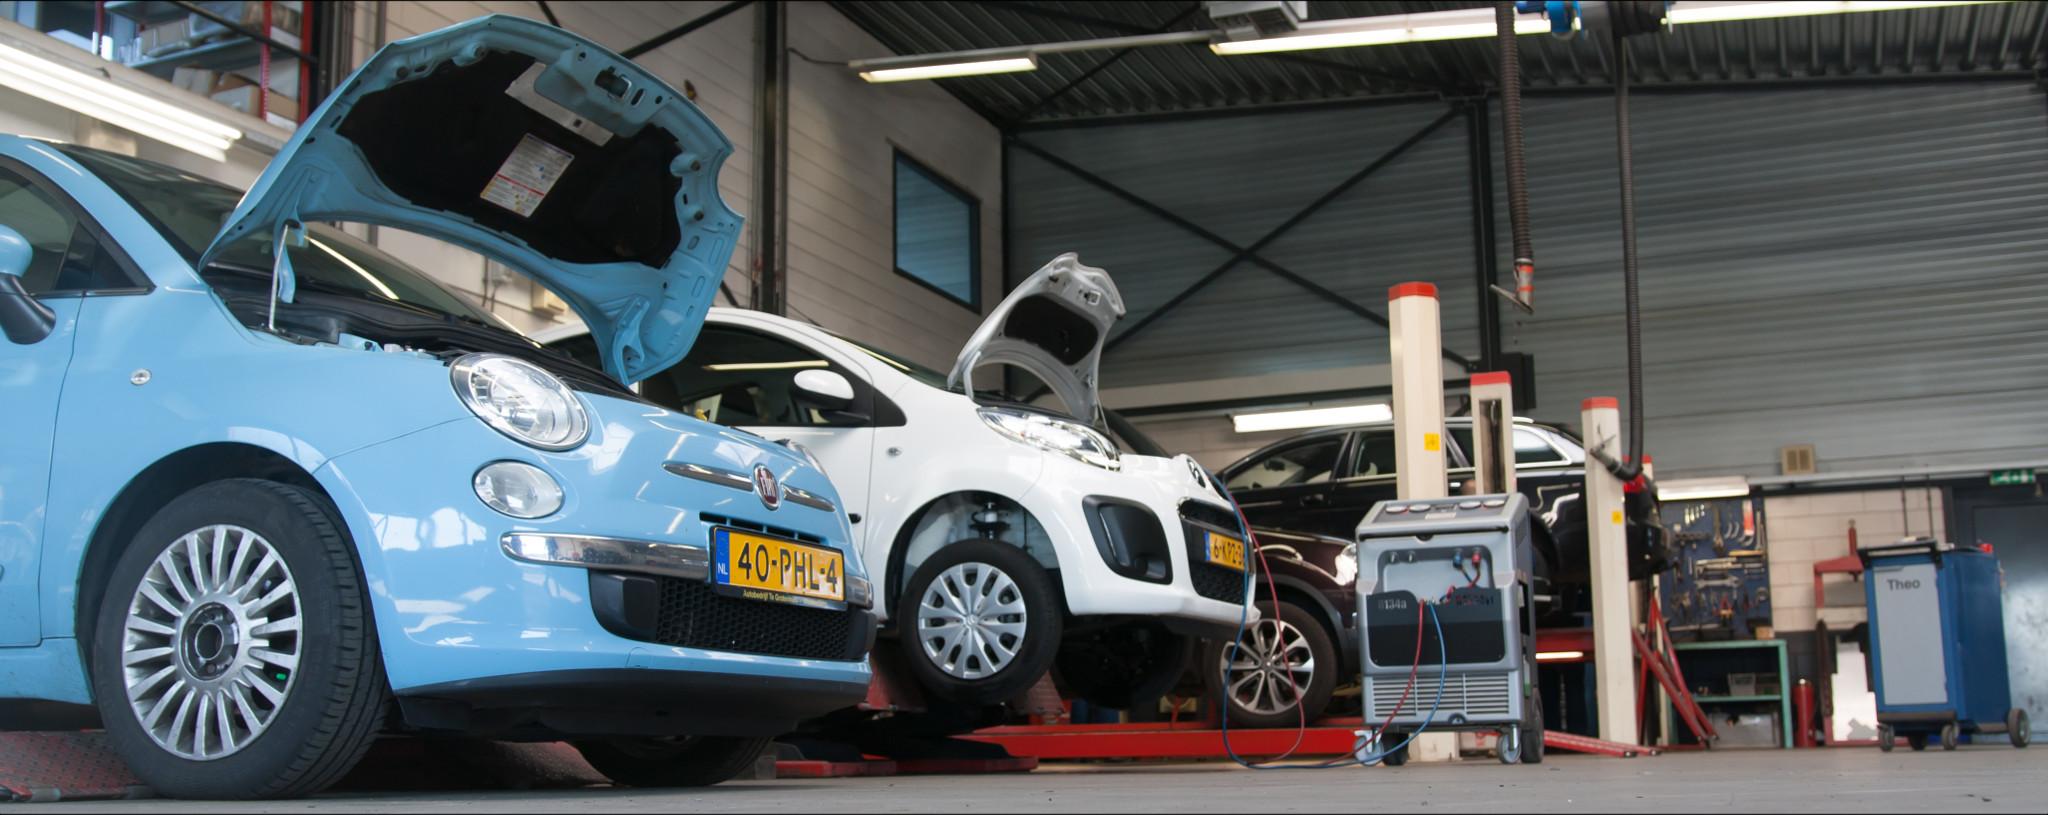 Werkplaats Autobedrijf Booltink